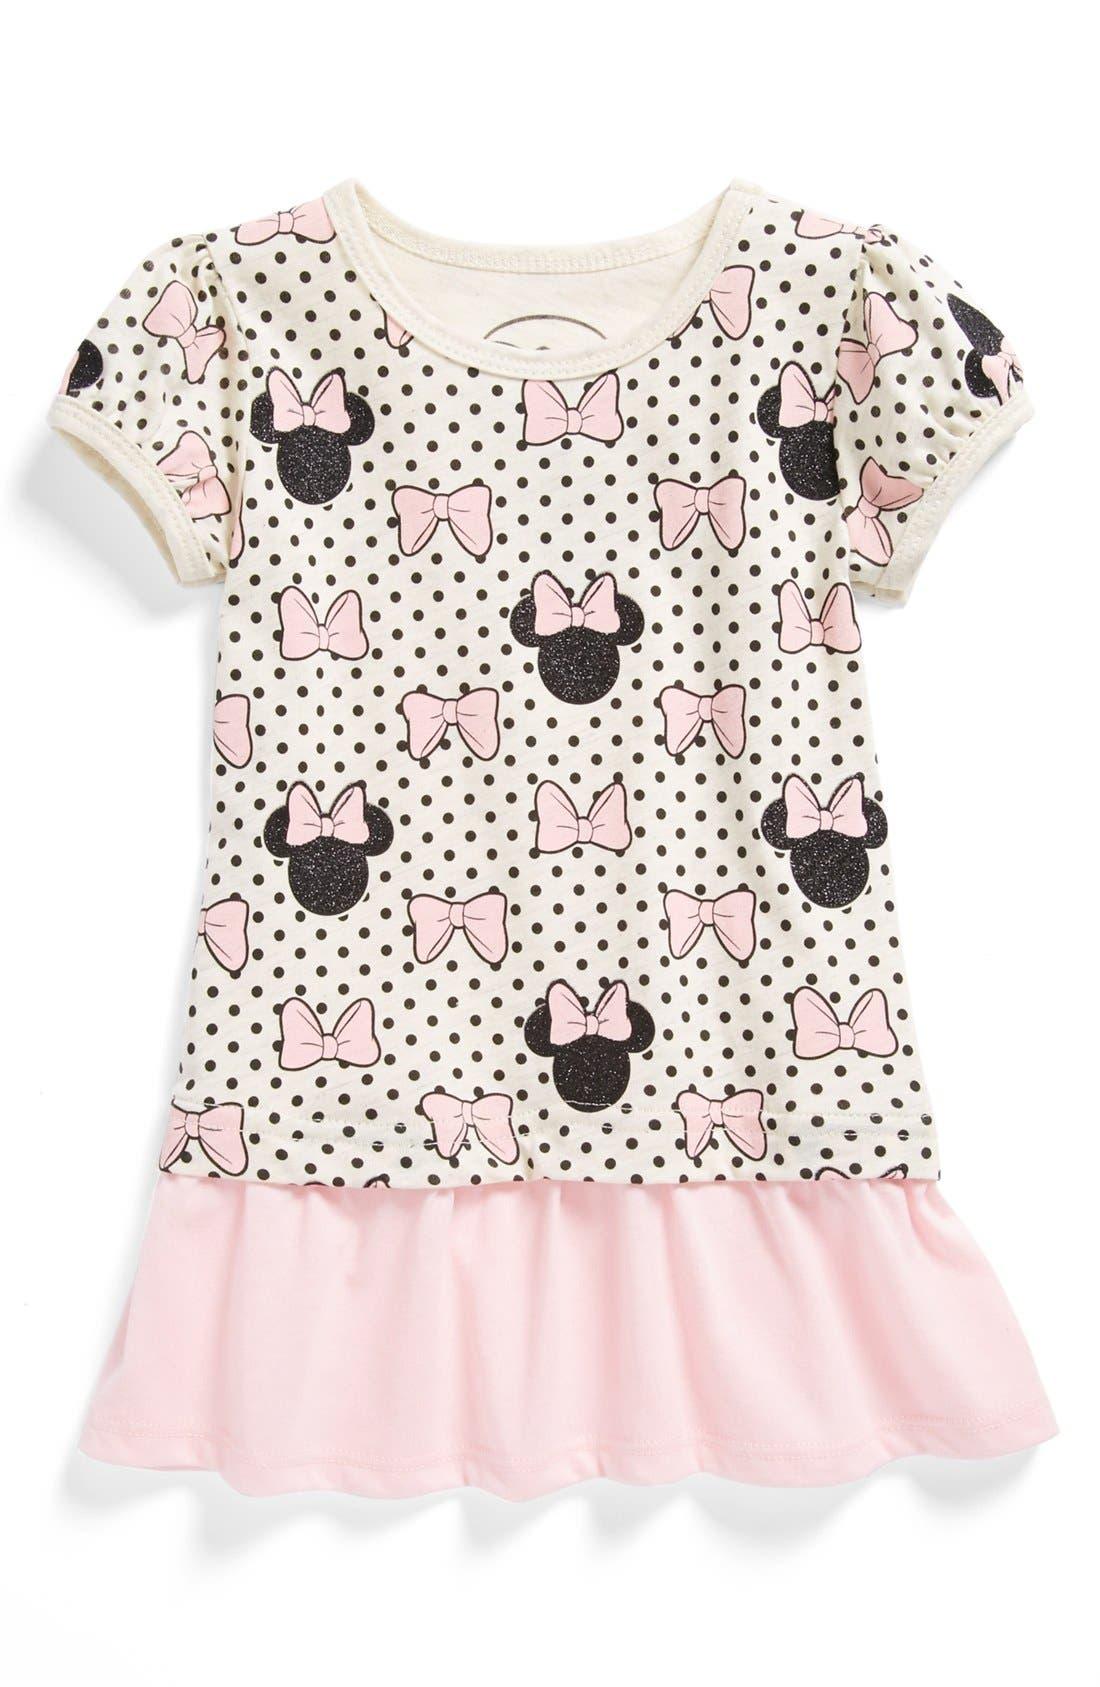 Main Image - Mighty Fine 'Minnie' Polka Dot Peplum Tee (Little Girls)